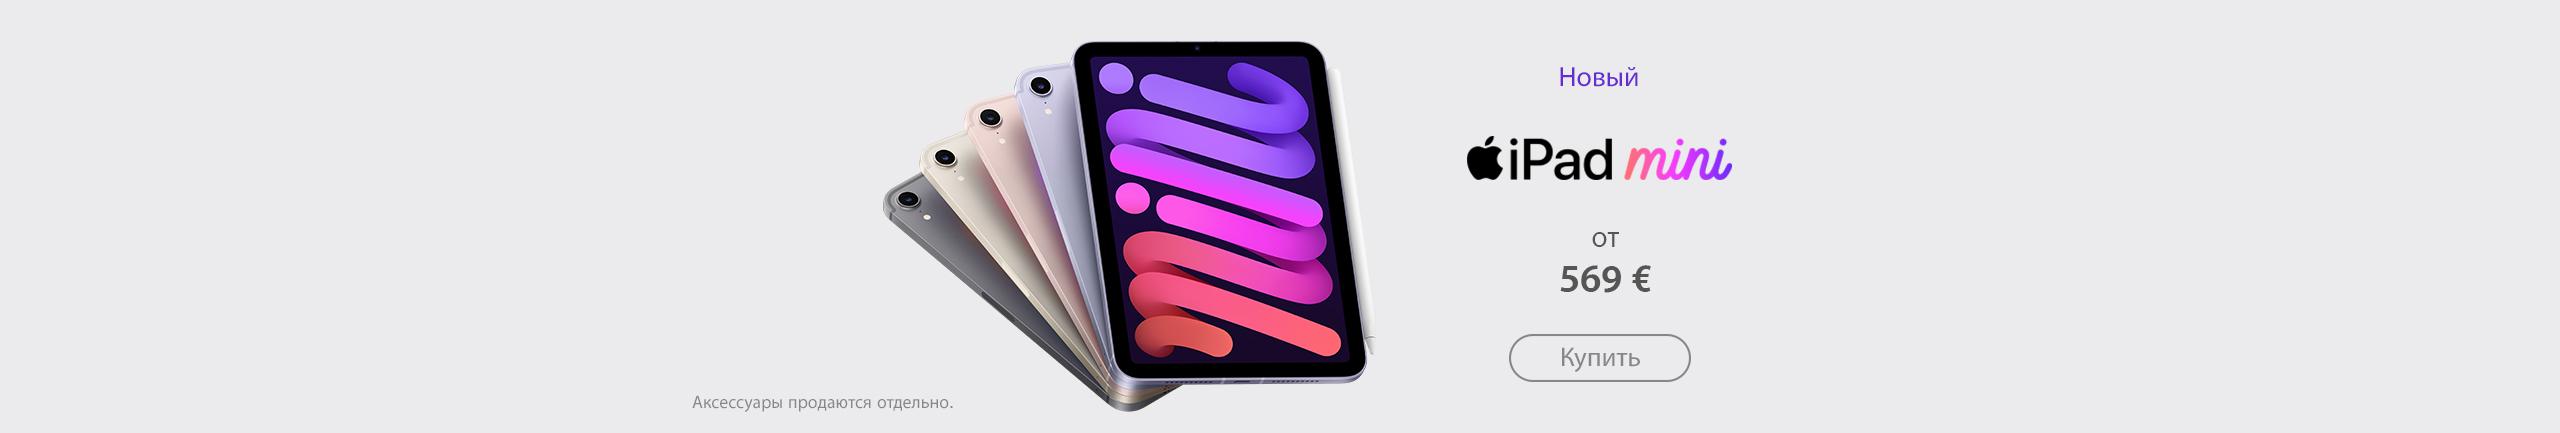 GR Apple ipad